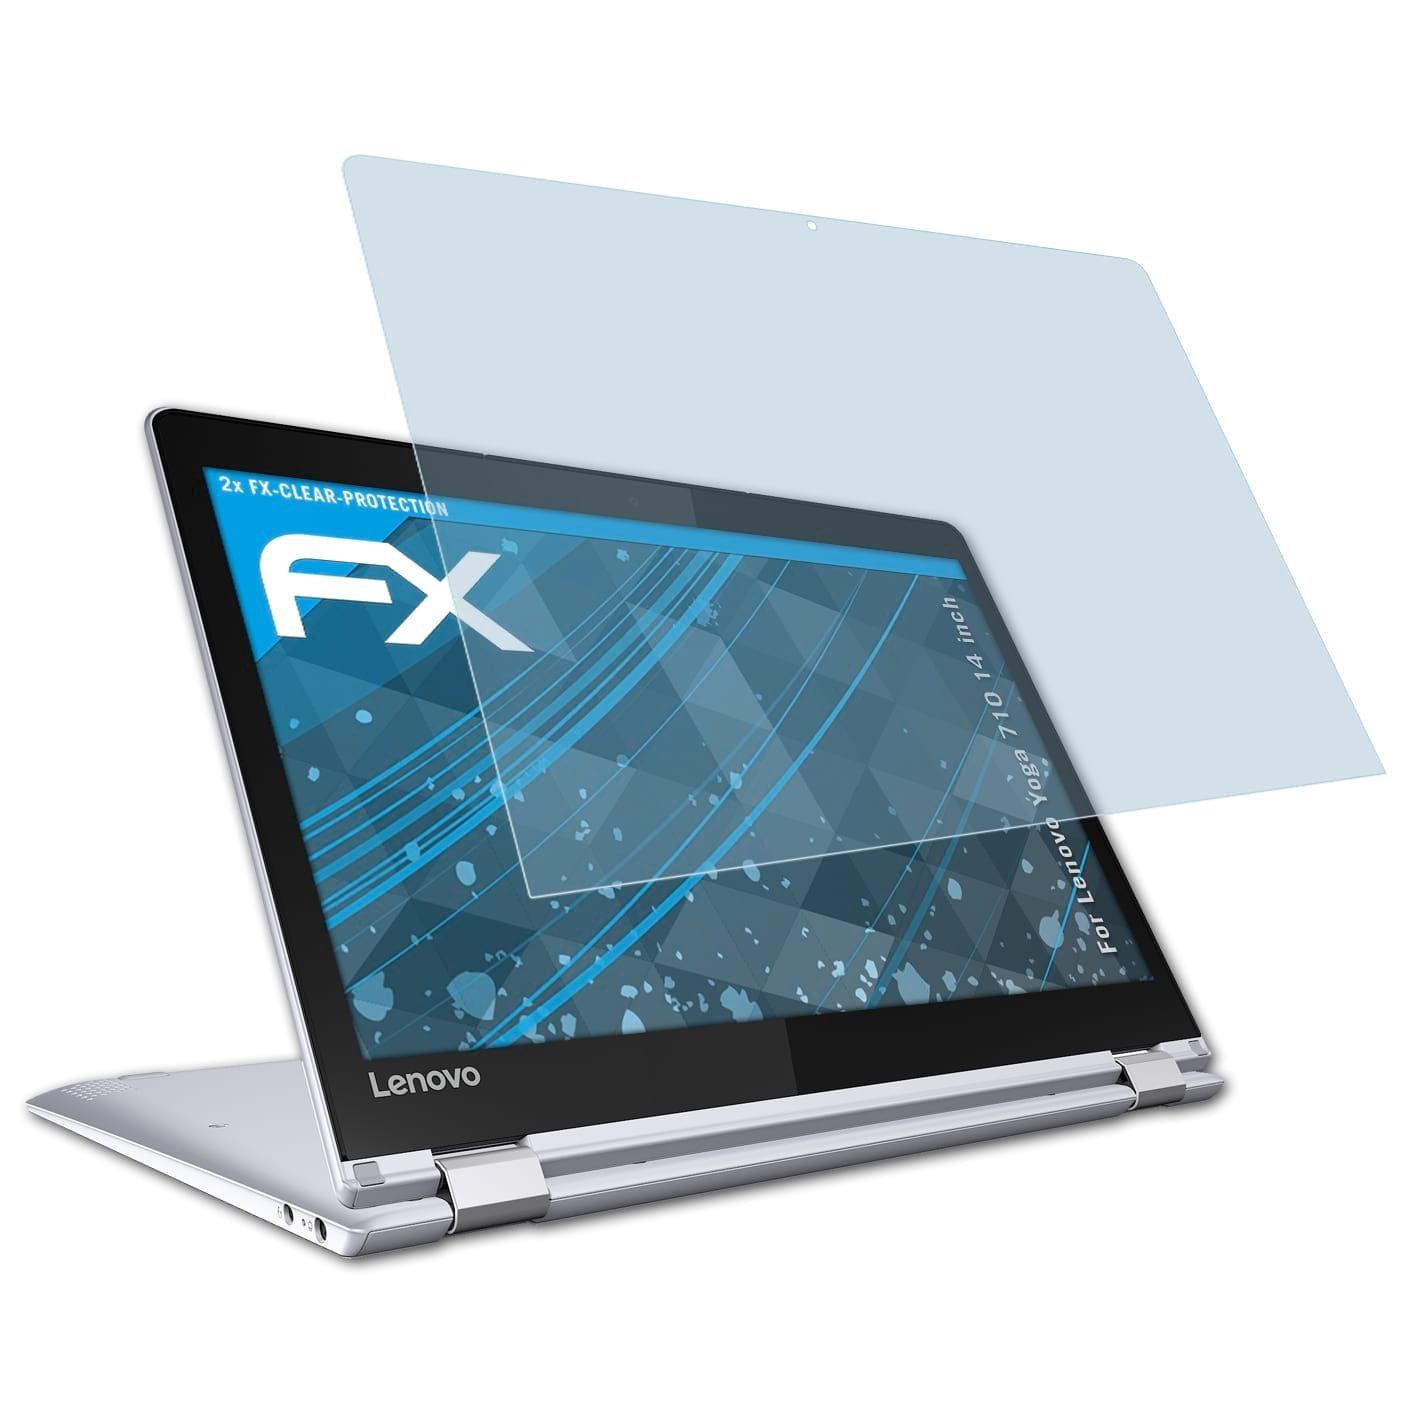 atFoliX Lámina Protectora de Pantalla Compatible con Lenovo Yoga 710 14 Inch Película Protectora, Ultra Transparente FX Lámina Protectora (2X)